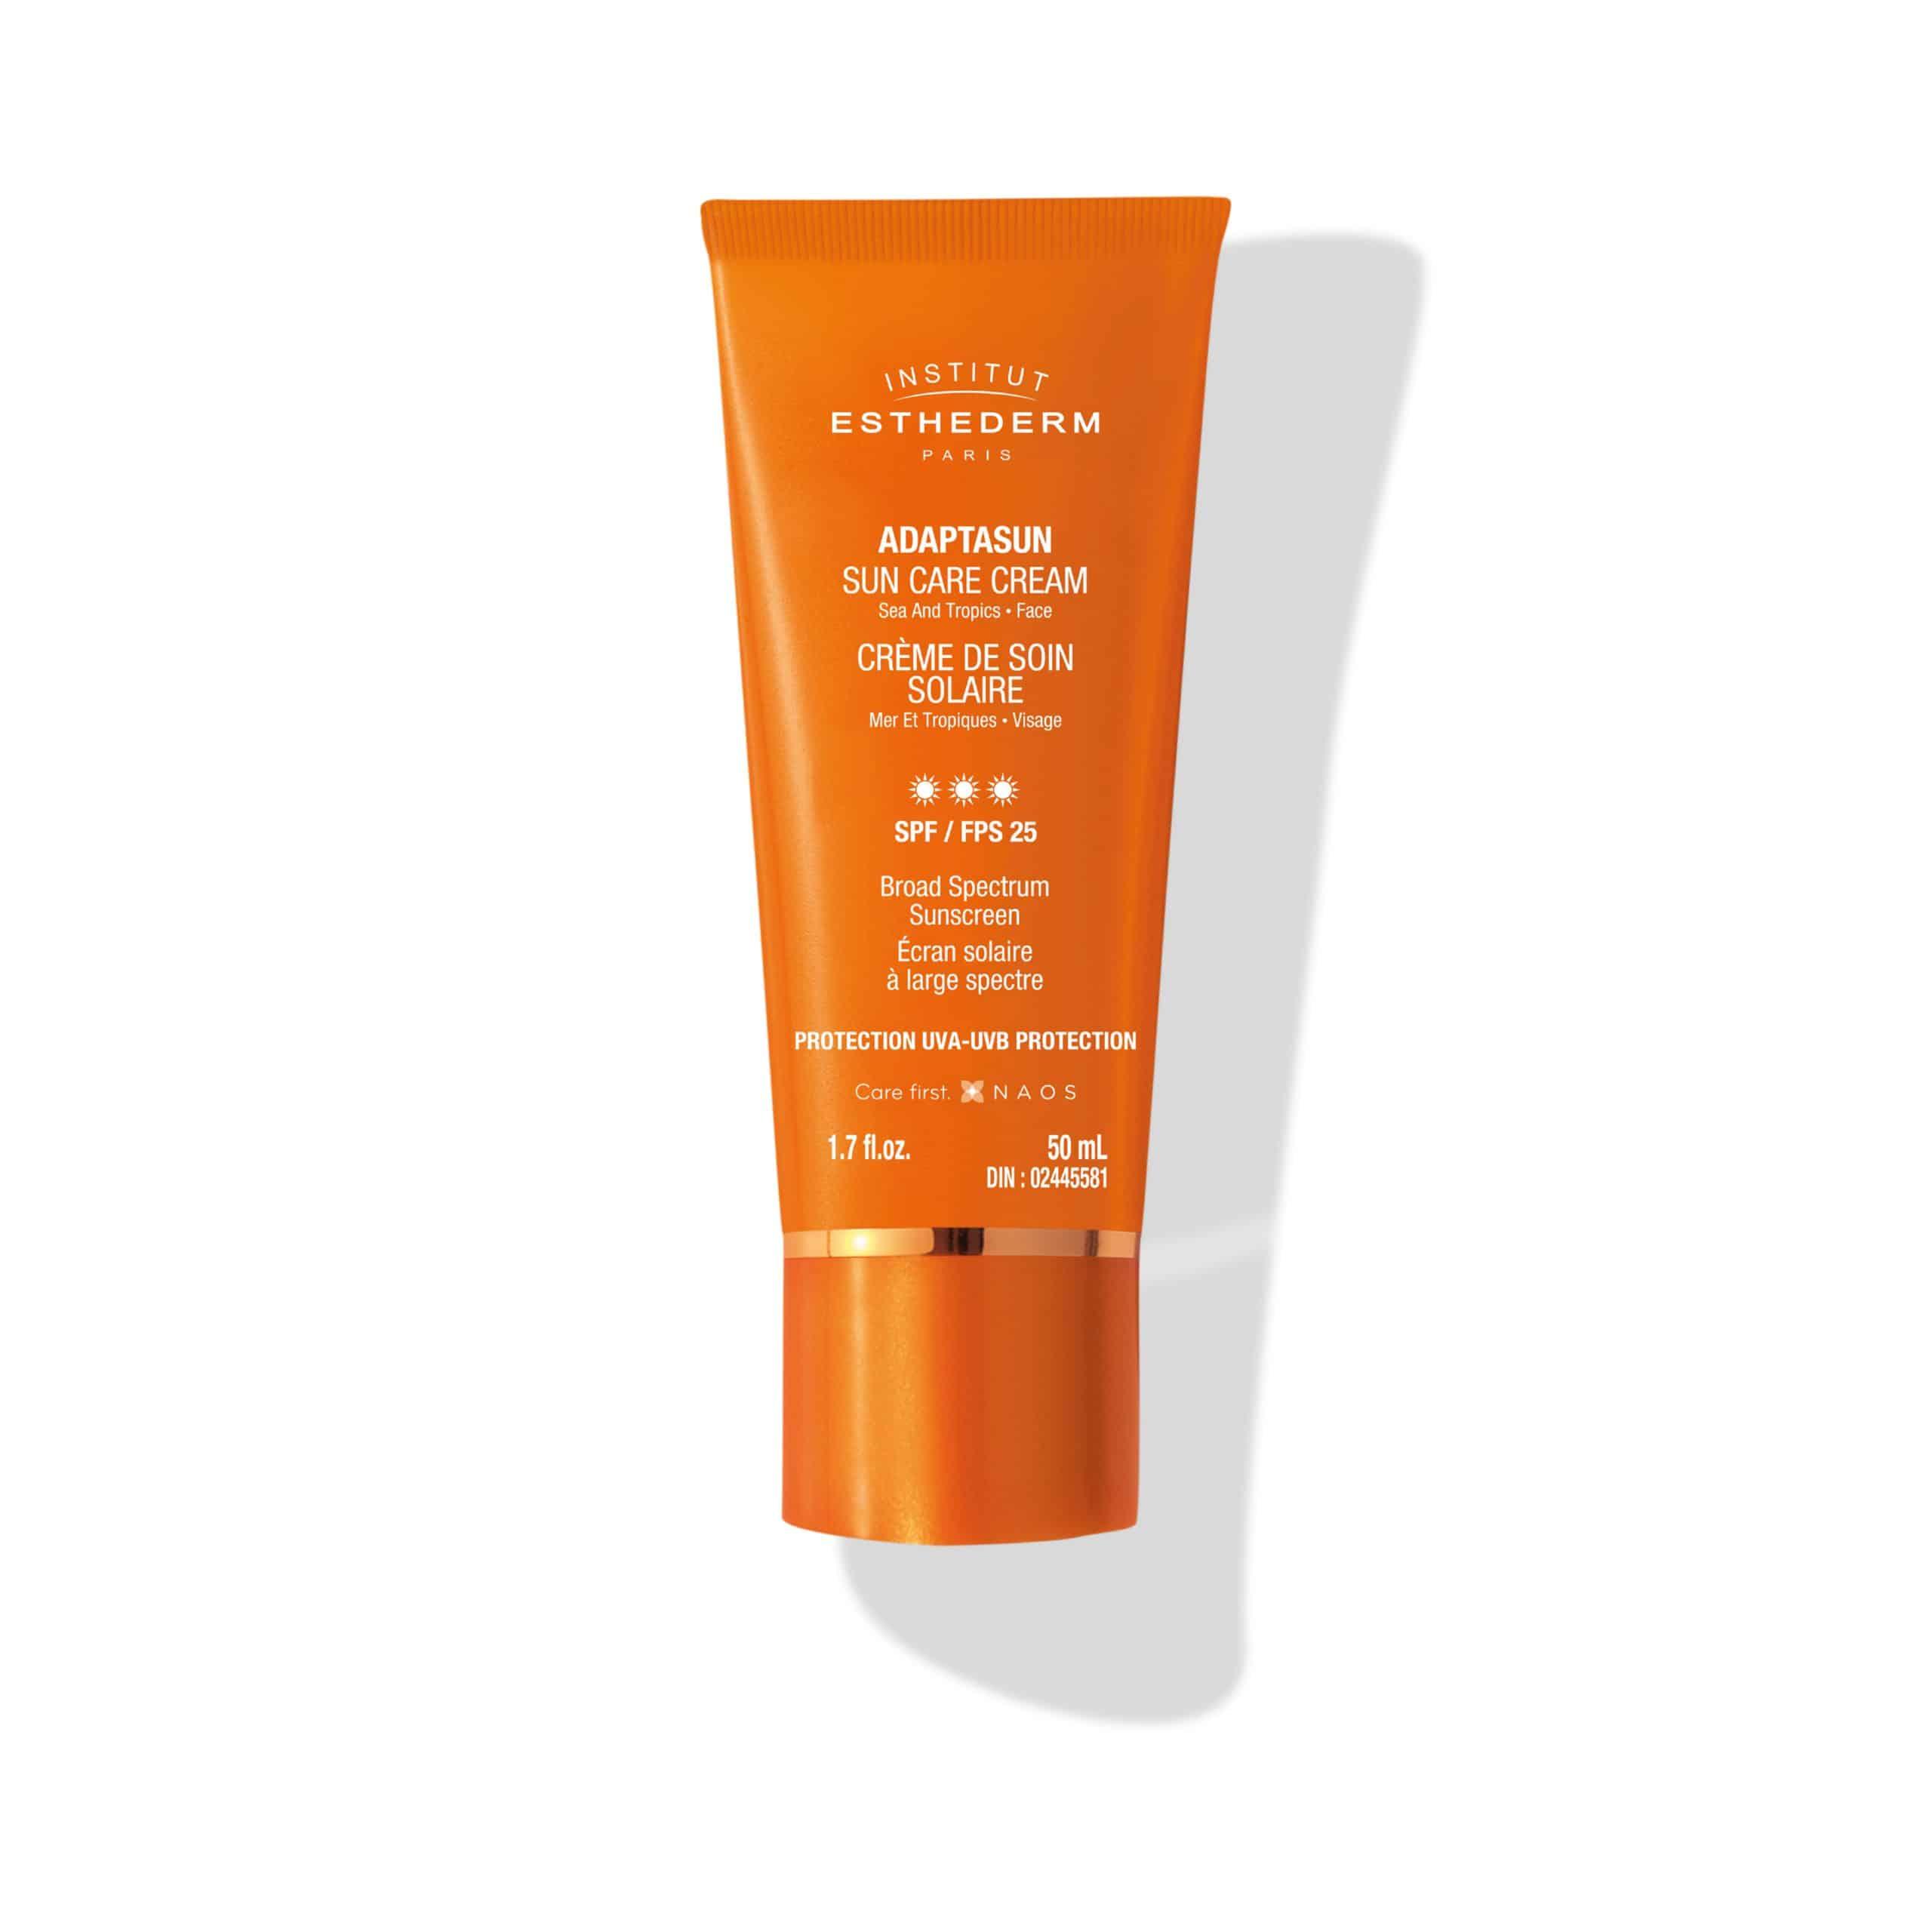 Adaptasun Sun Care Cream – Face SPF 25